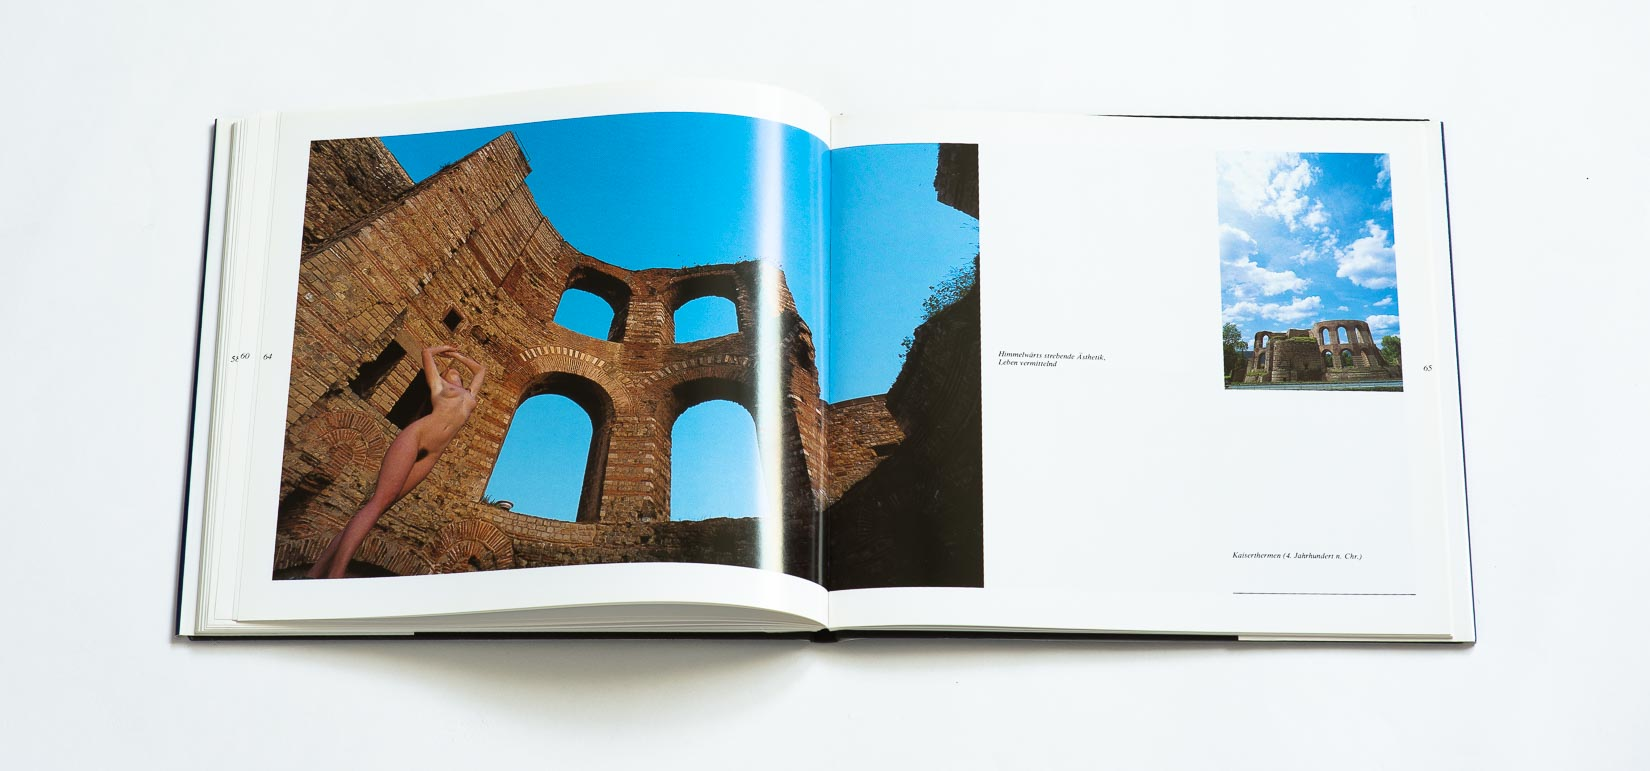 Bildband Trier, Fotografie. Yousef A.P. Hakimi, Text: Heinz Monz, ISBN: 3-929405-03-8